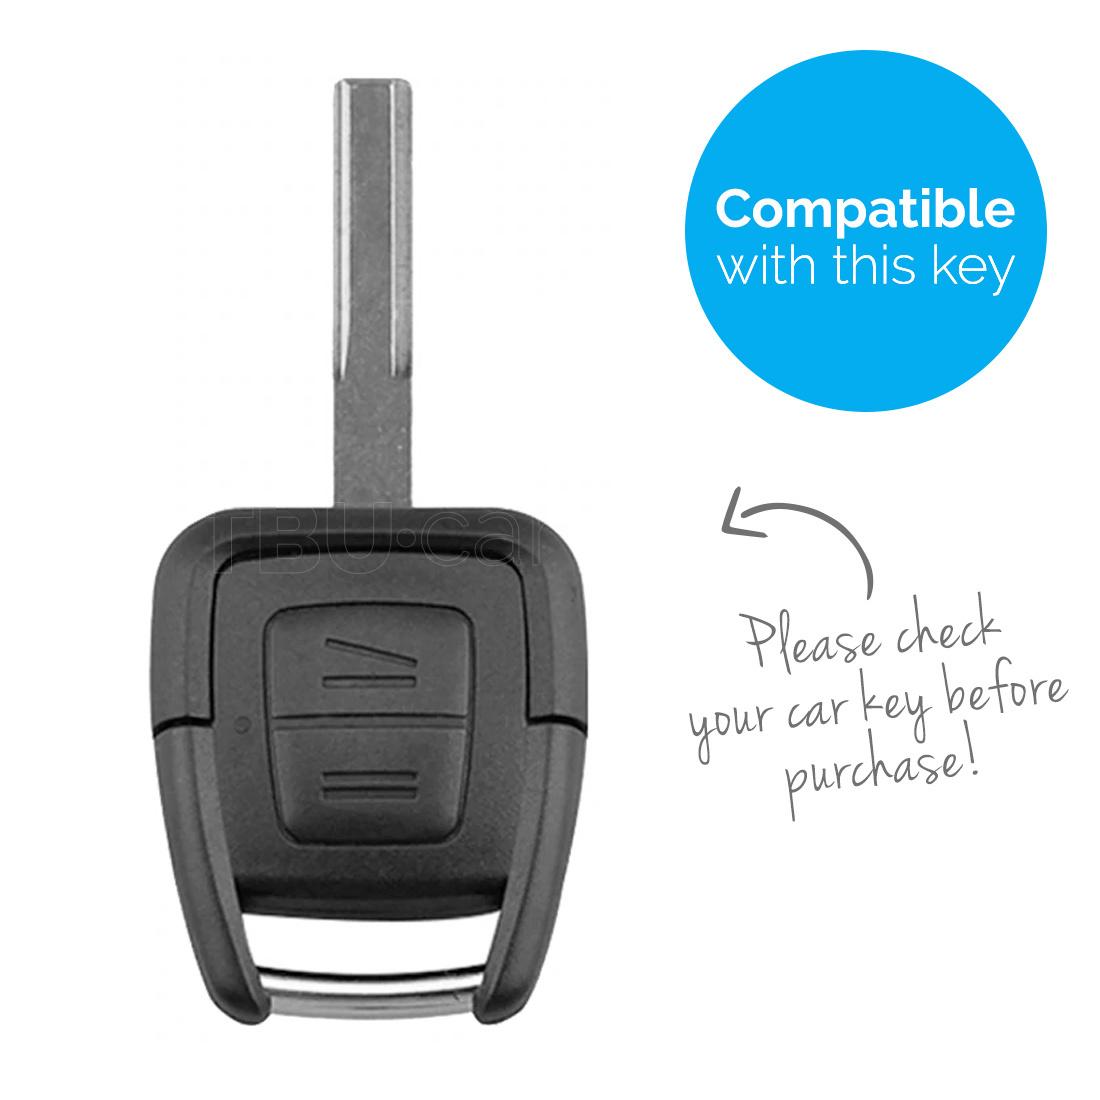 TBU car Autoschlüssel Hülle für Vauxhall 2 Tasten - Schutzhülle aus Silikon - Auto Schlüsselhülle Cover in Rosa